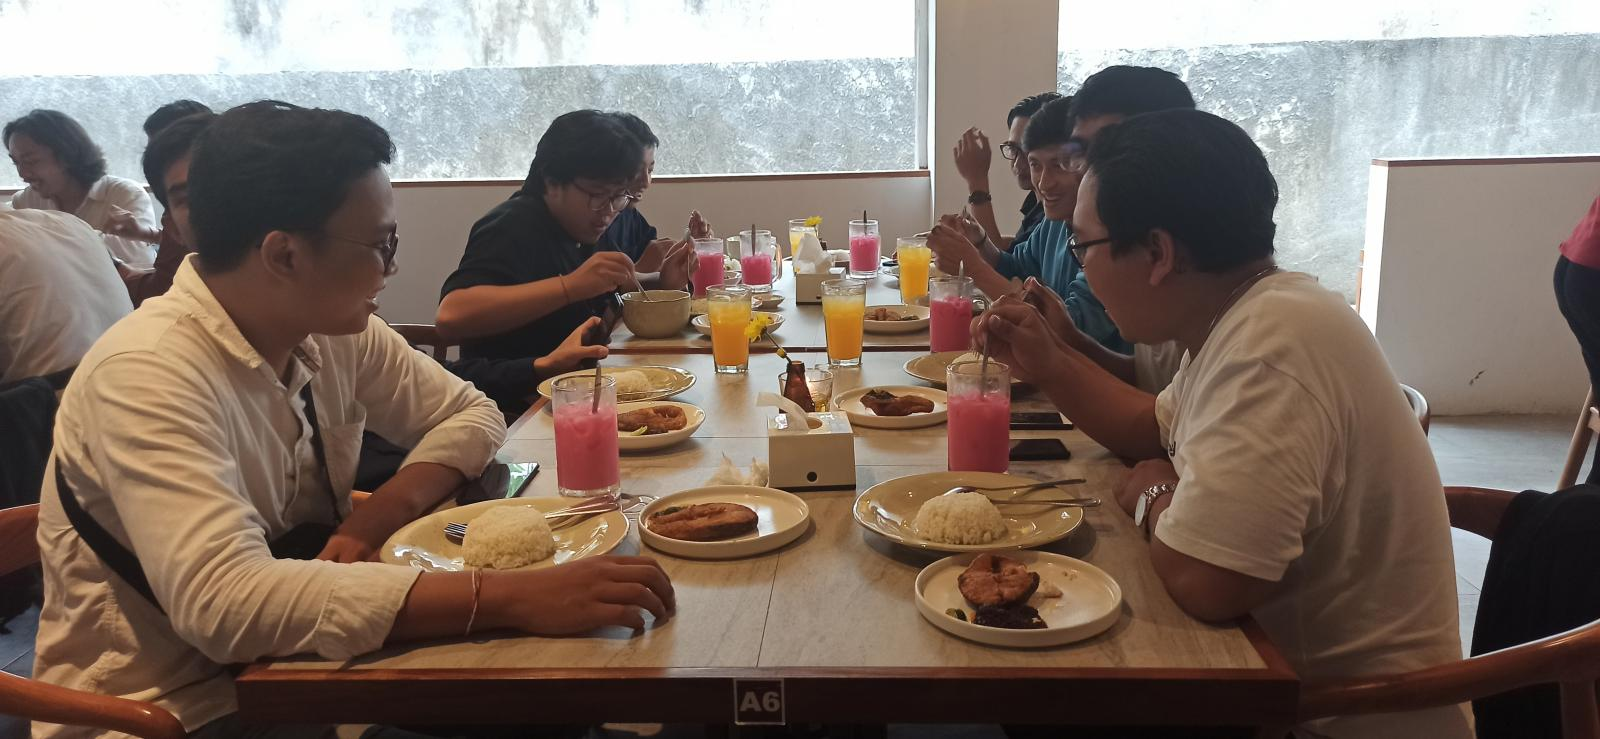 Gathering Event with Emporio Architect Bali Team at IGOR Renon 3